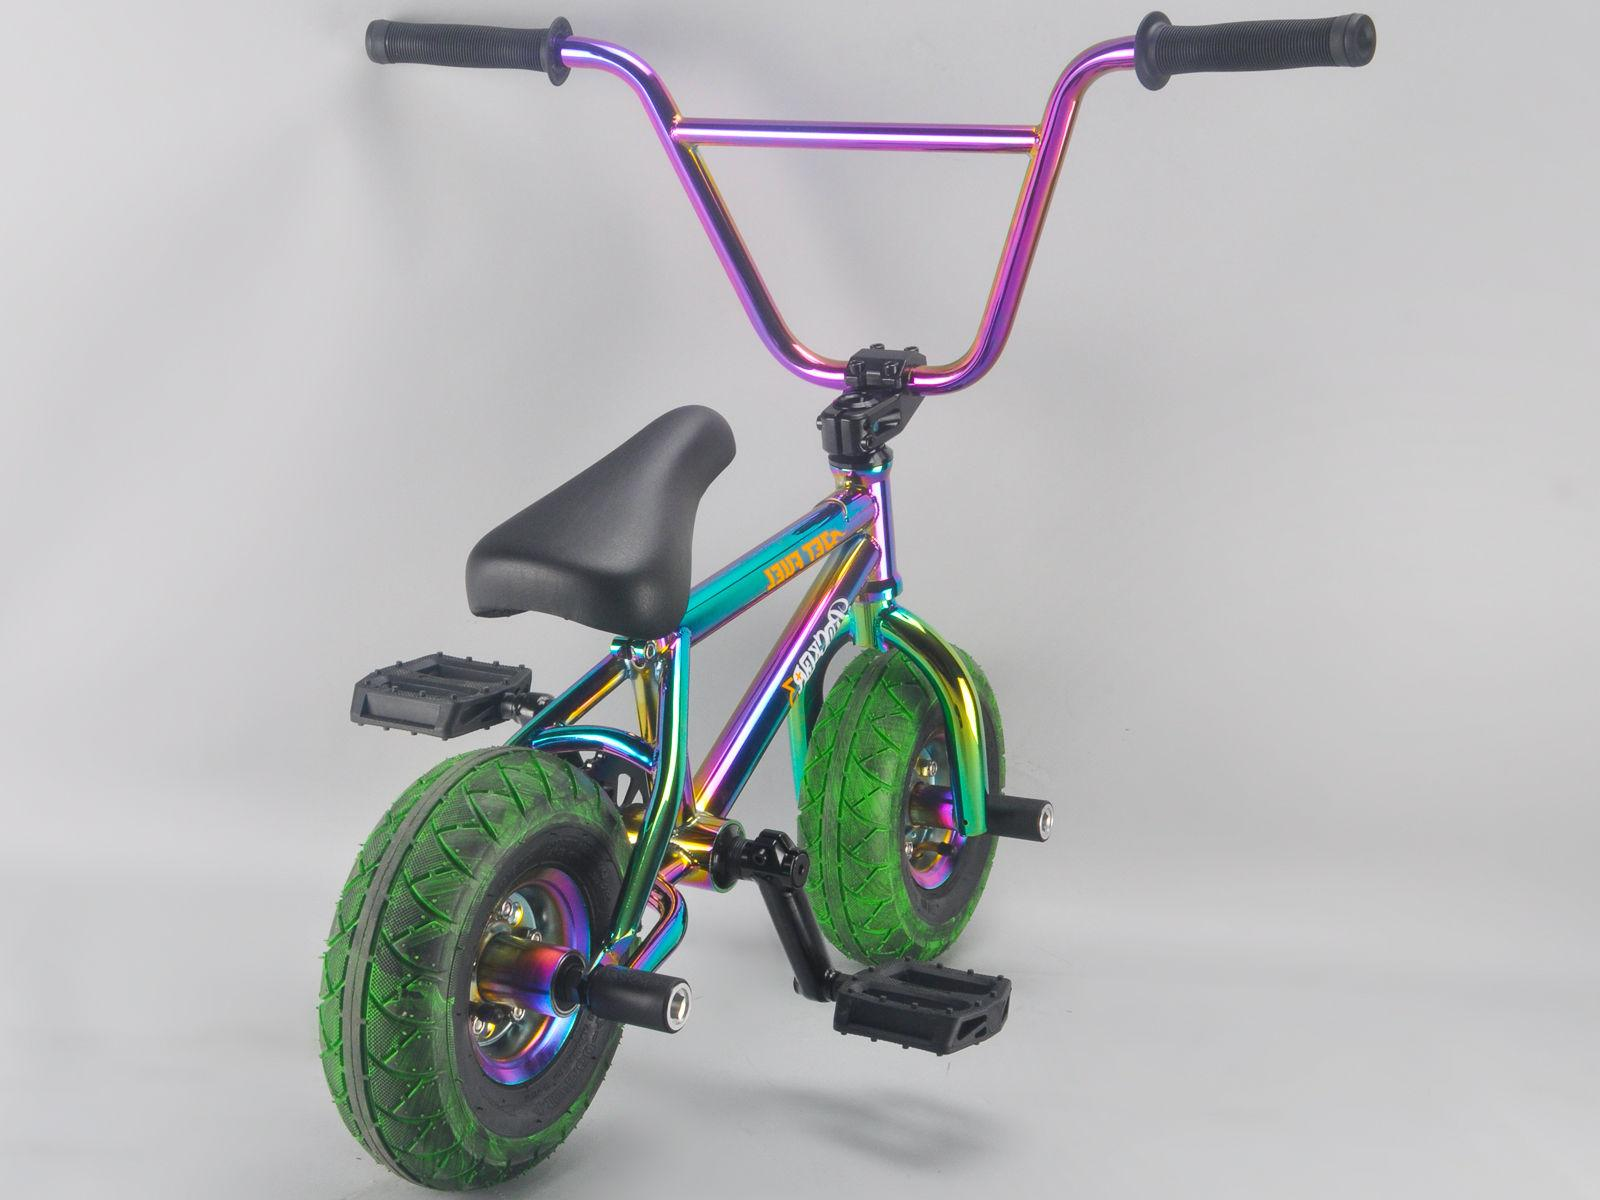 *GENUINE ROCKER* FUEL Rocker 3+ BMX RKR Mini BMX Bike Fat boy, R3